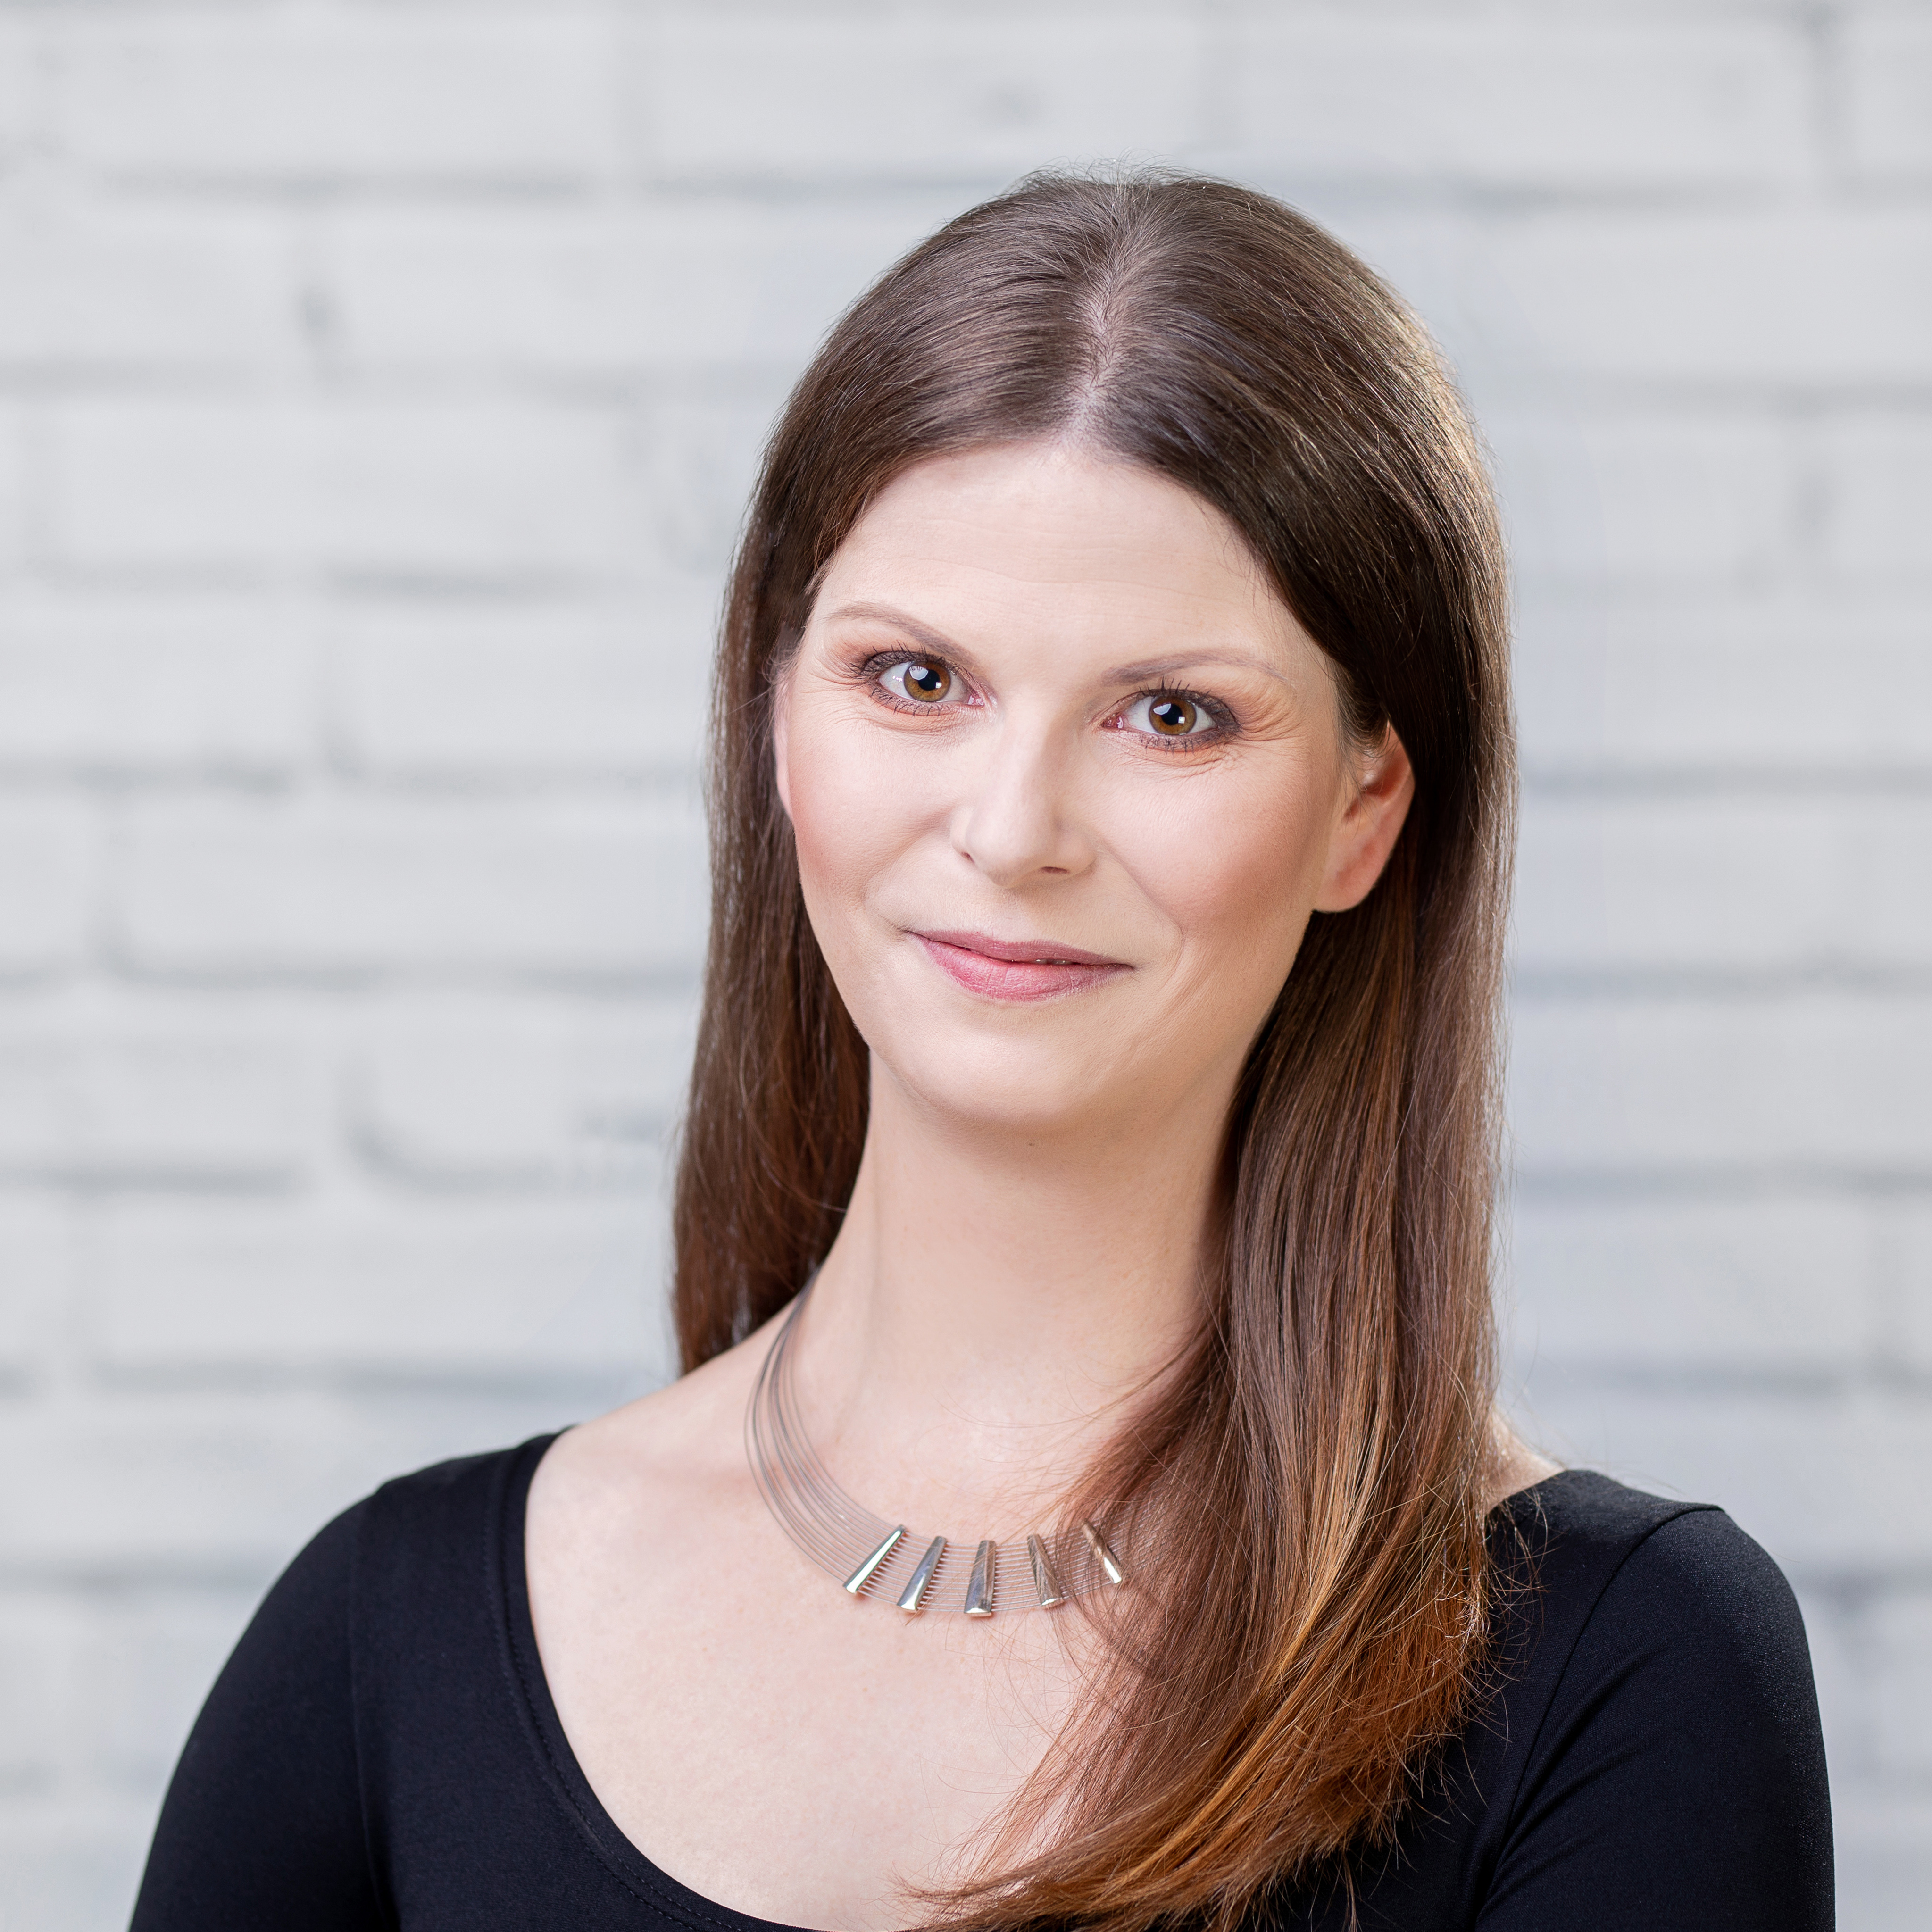 Katarzyna Żółtowska